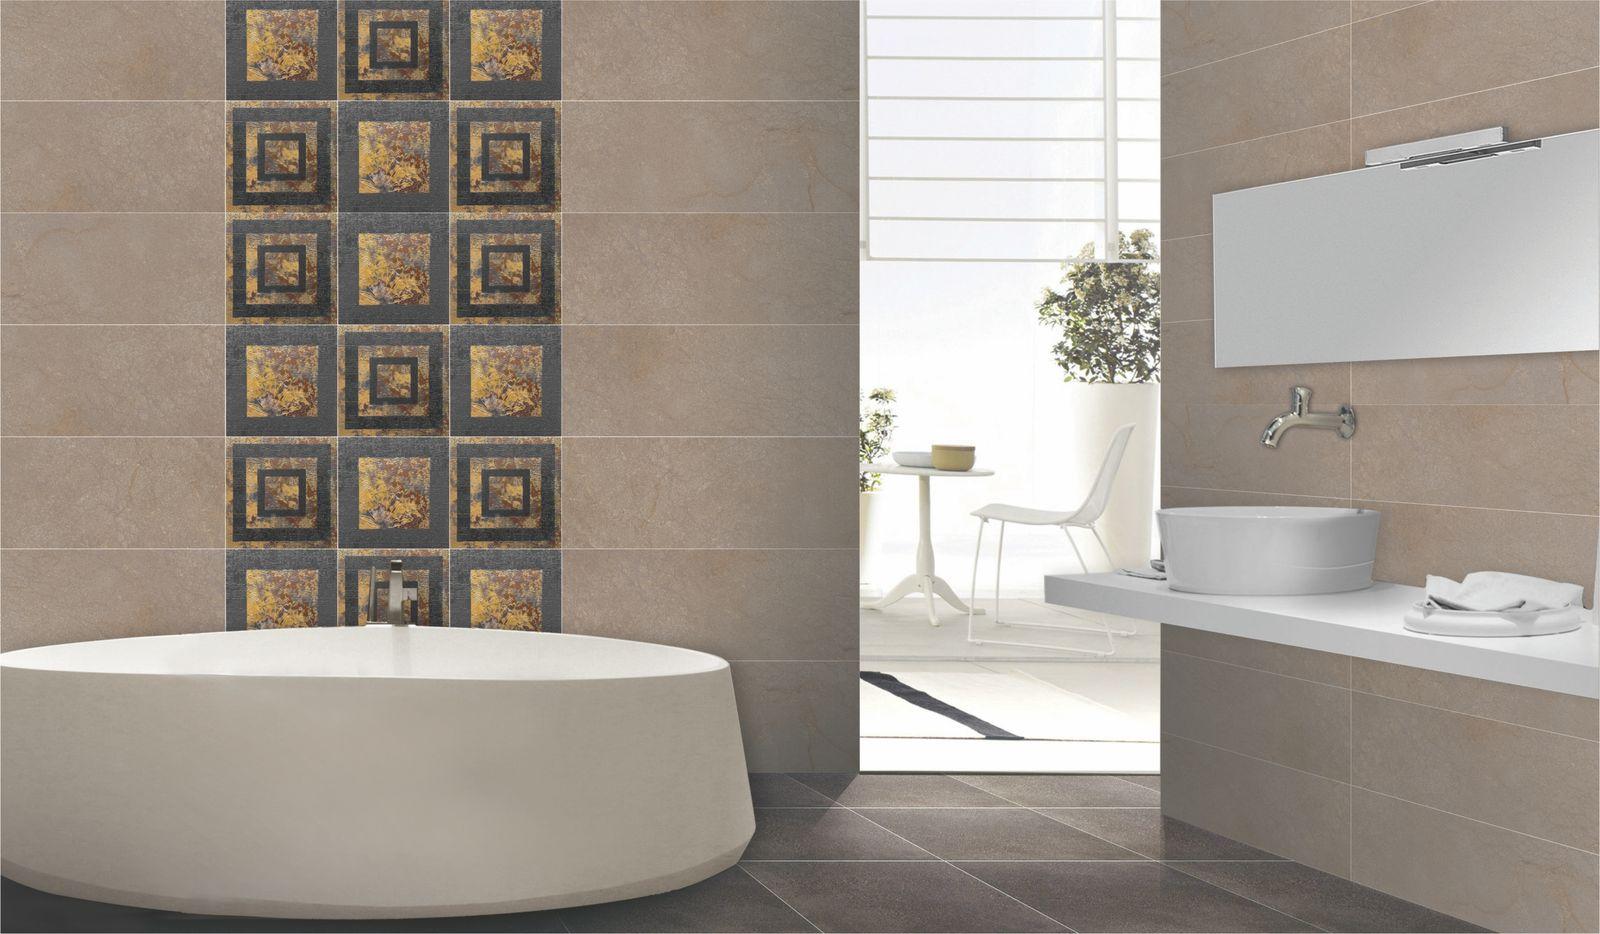 luxury imp 058 a b 30x30 cm layout result